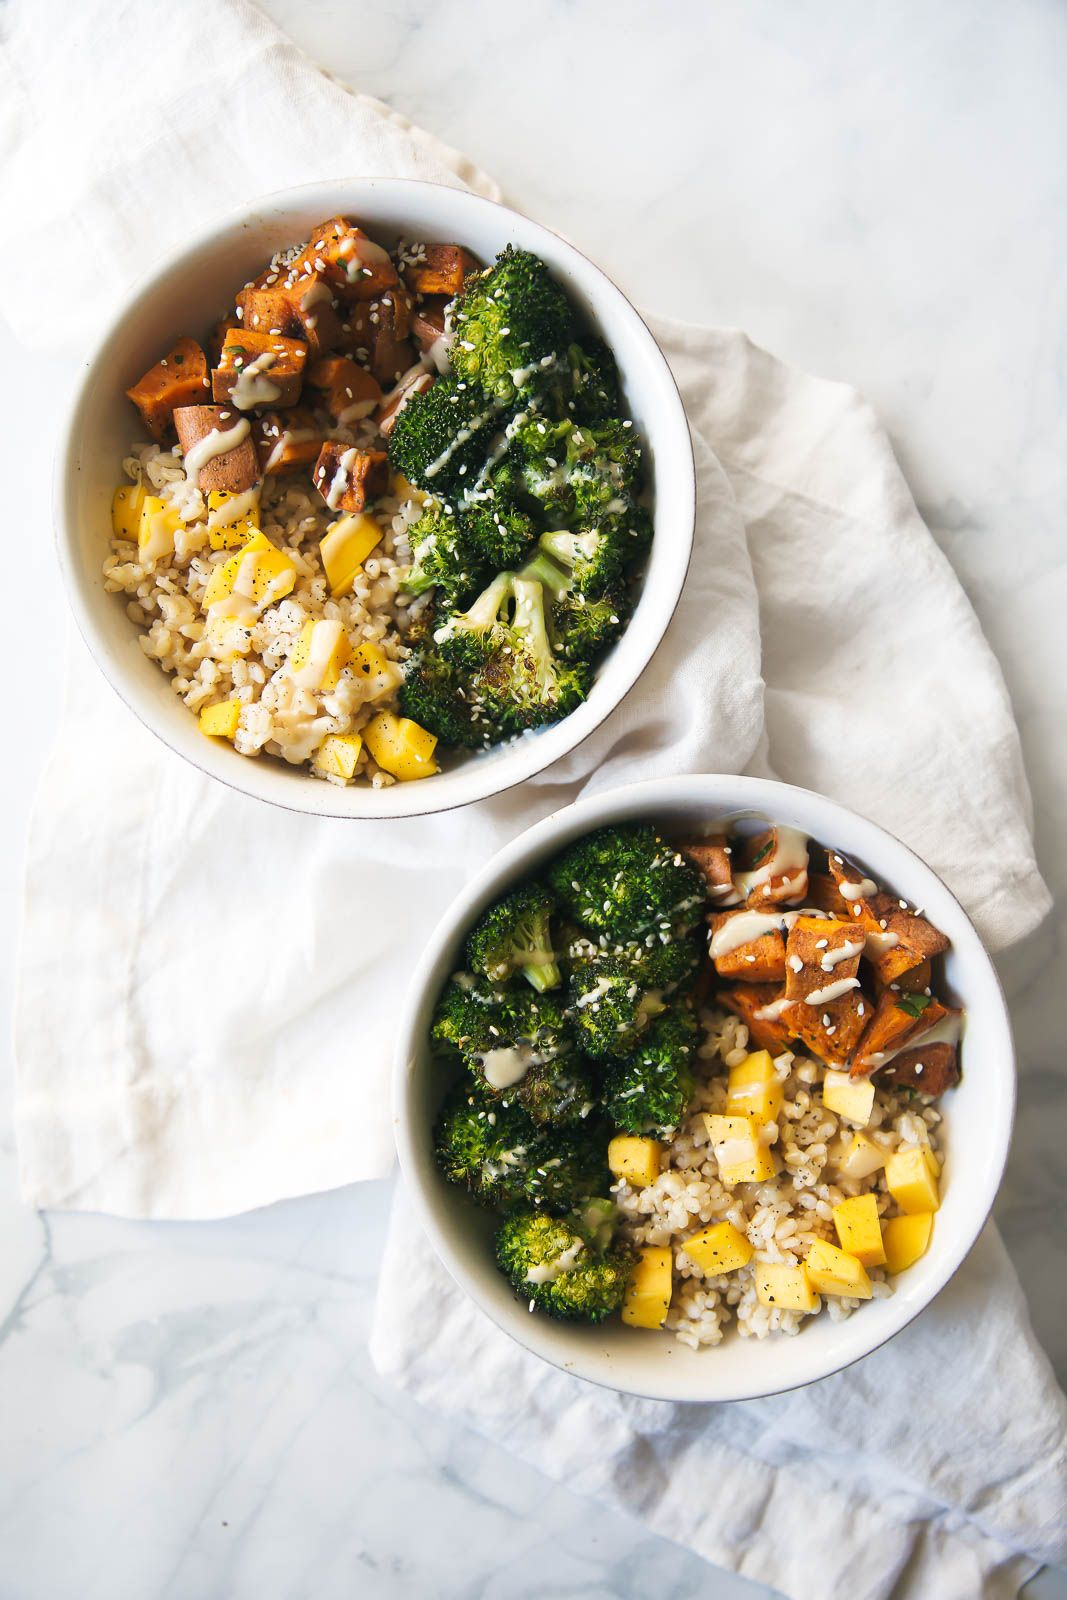 Vegan Sweet Potato Buddha Bowls with Almond Butter Dressing #vegan #potato #vegetables #breakfast #food